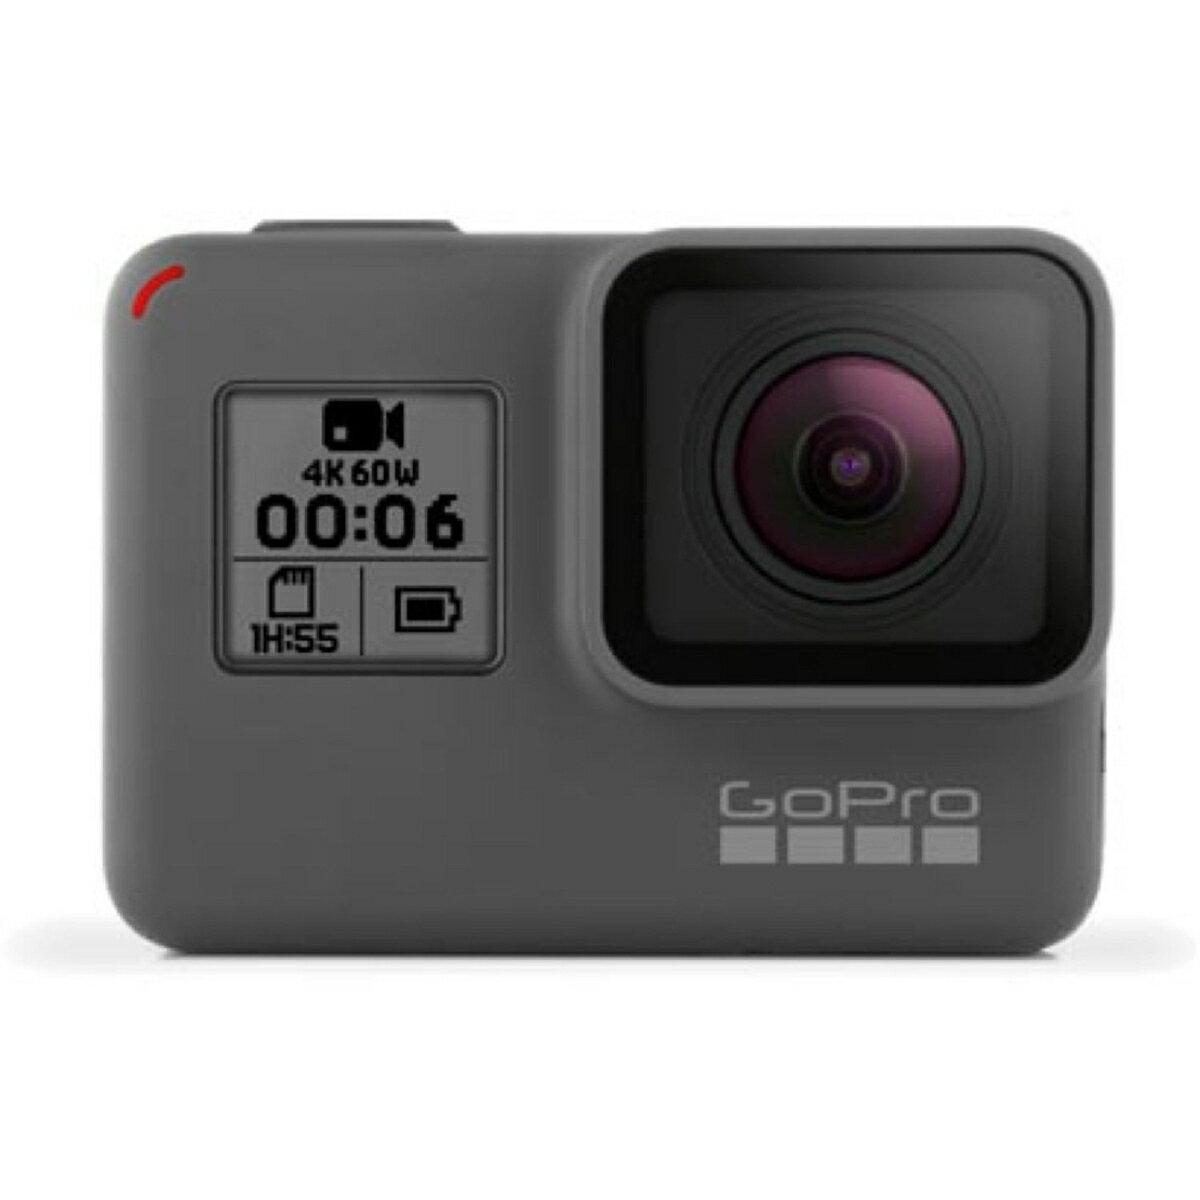 GoPro HERO6 Black ウェアラブルカメラ CHDHX-601-FW